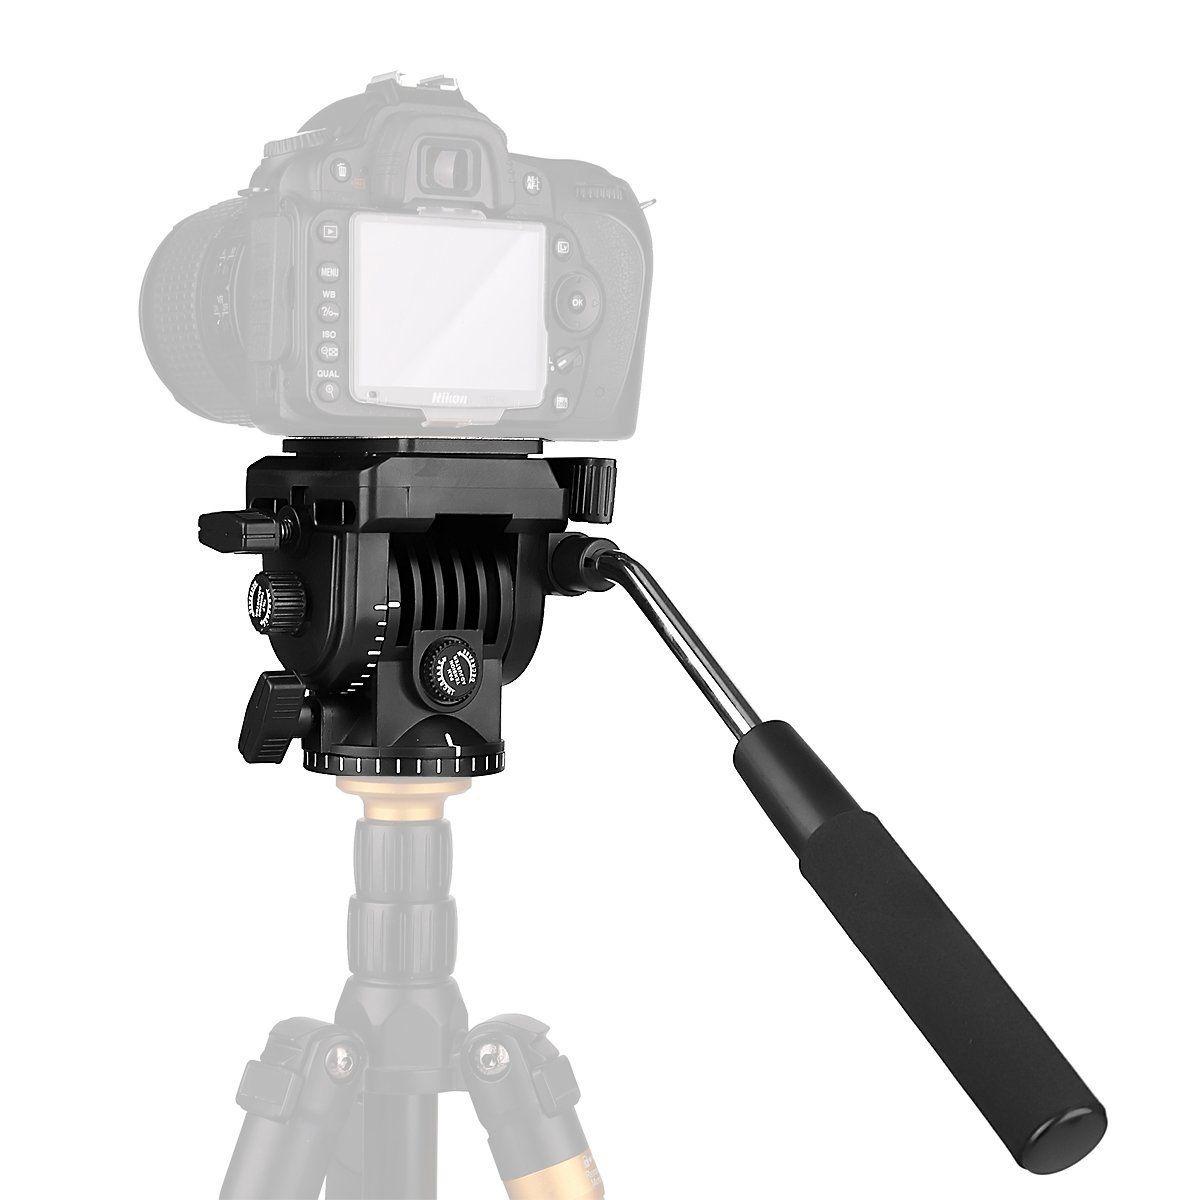 Pangshi Video Camera Tripod Action Fluid Drag Pan Head For Canon Nikon D3300 Kit 18 55mm Vr Hitam Sony Dslr Camcorder